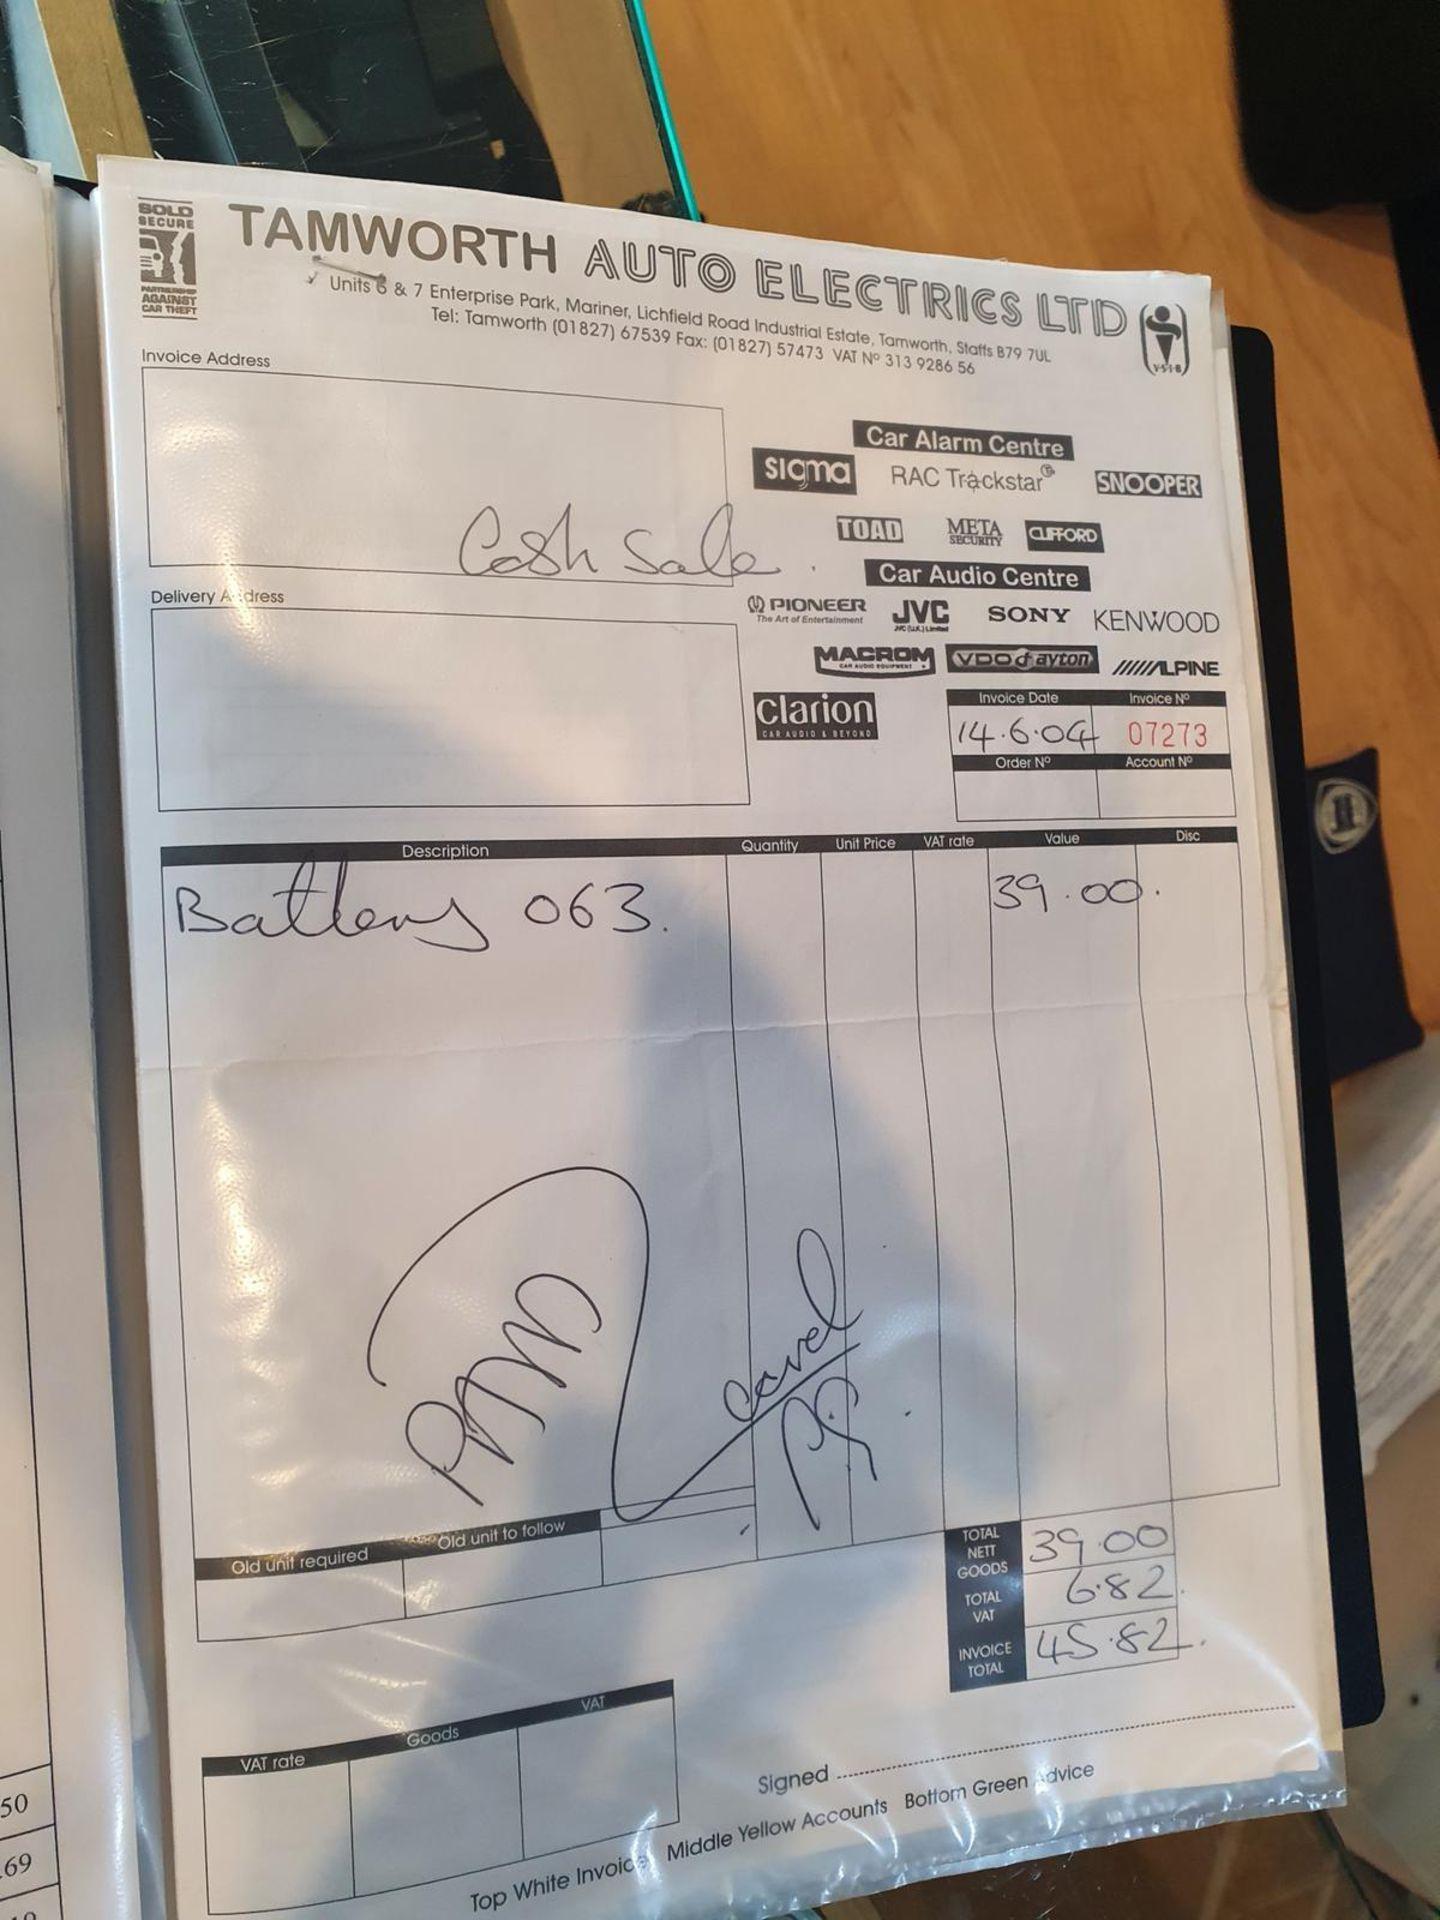 1992 LANCIA DELTA EVO 1 HF INTEGRALE, 51,000 MILES, FULL HISTORY, PETROL ENGINE *PLUS VAT* - Image 25 of 28